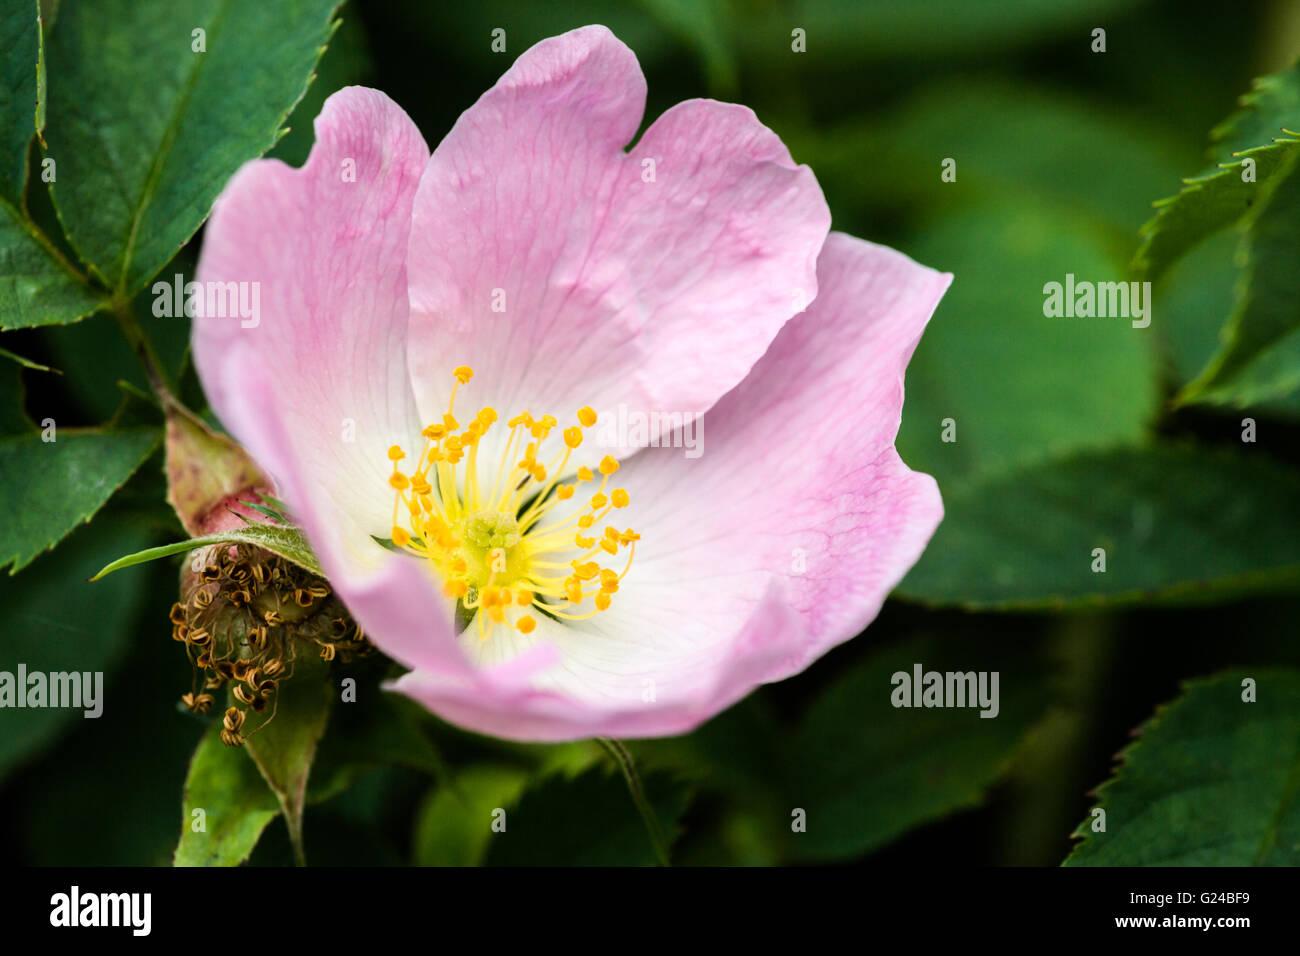 Hundsrose Rosa Canina Blume Berkshire, Vereinigtes Königreich Stockbild